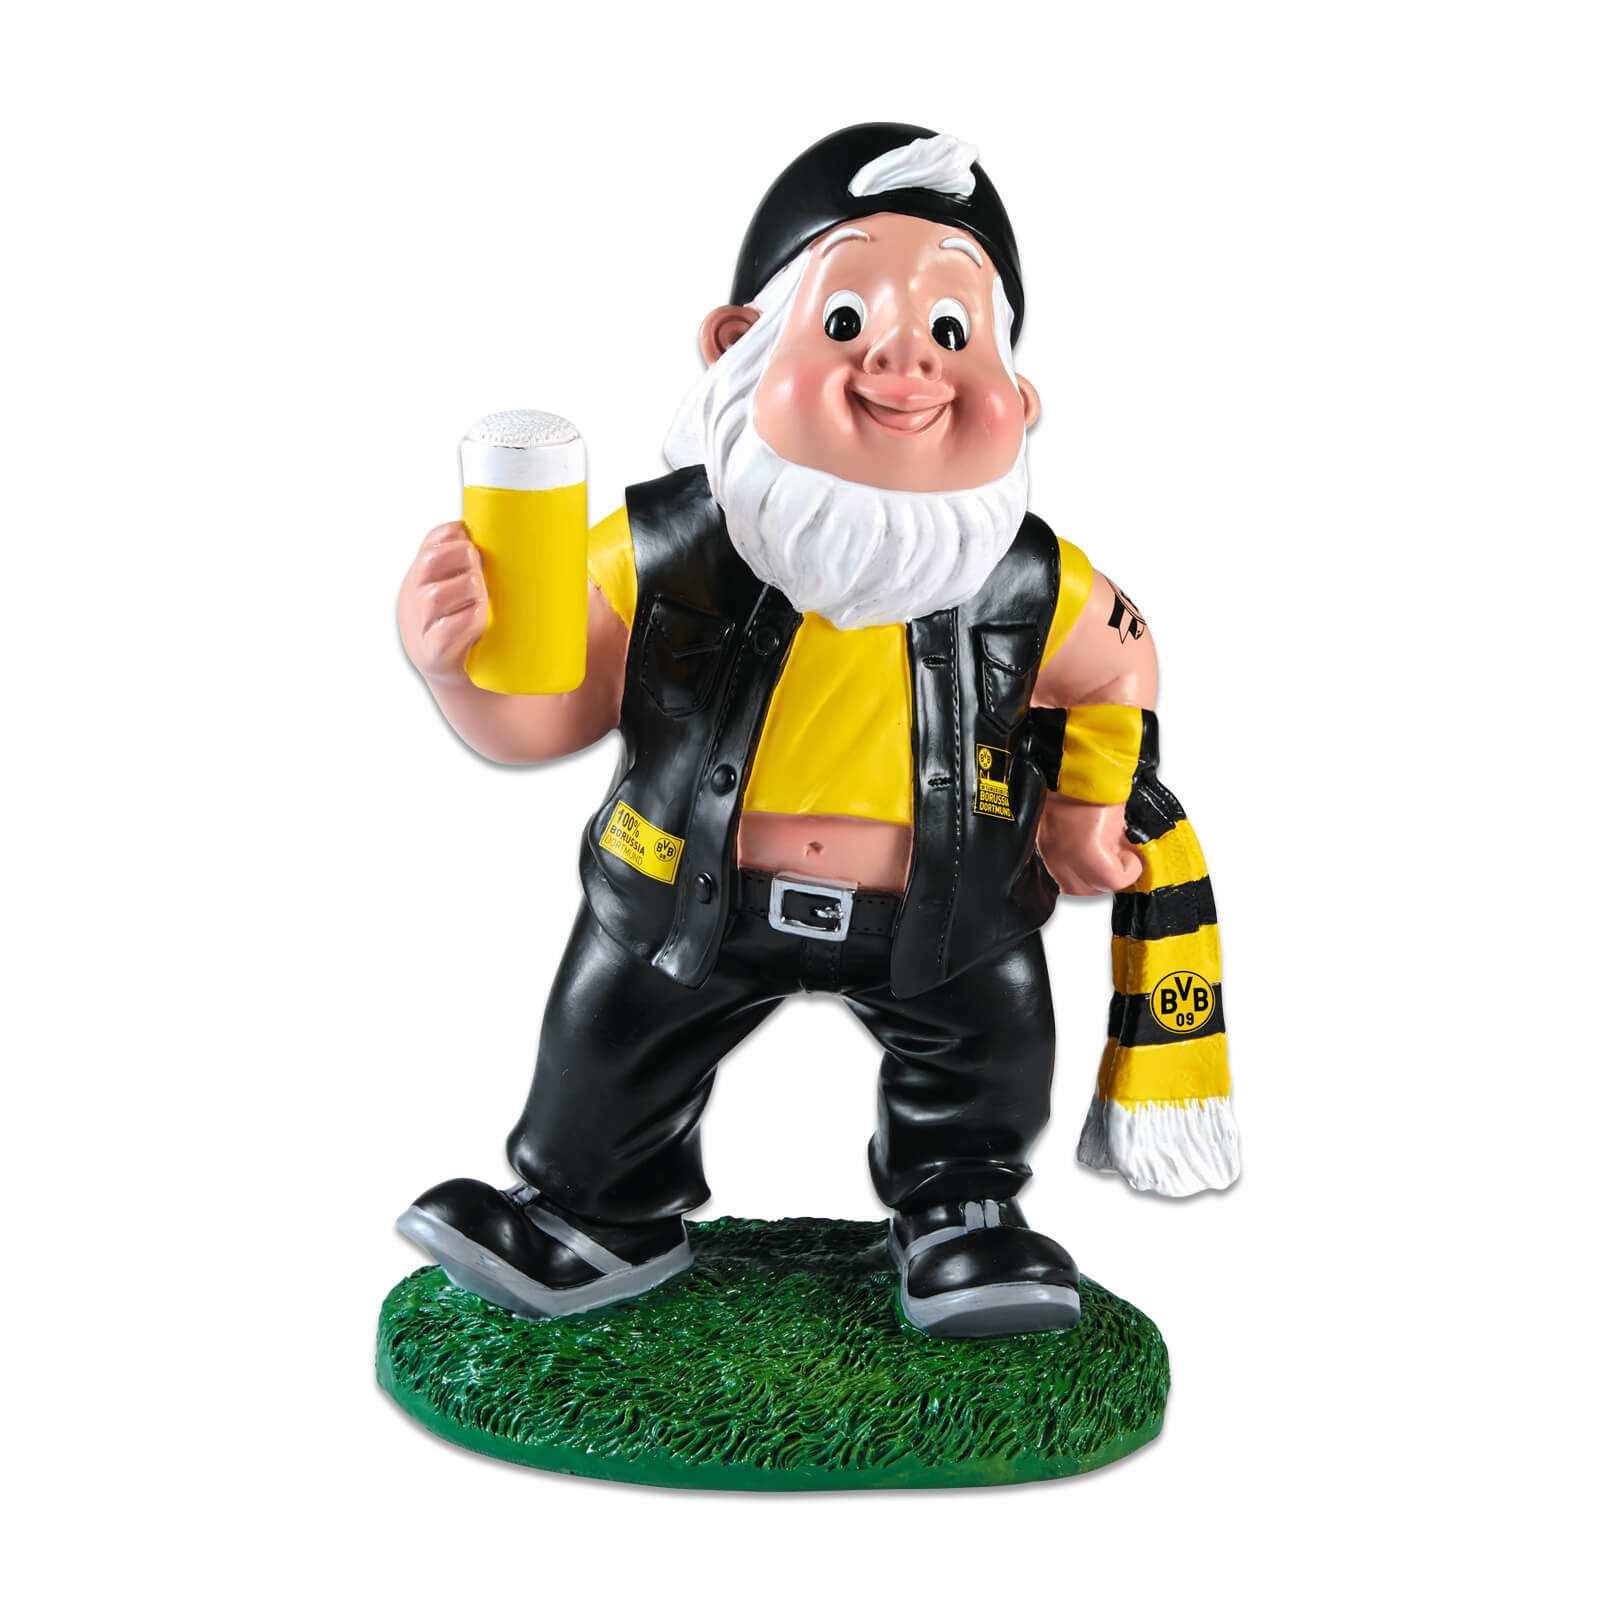 BVB Schlüsselanhänger in Trikotform 19//20  Borussia Dortmund